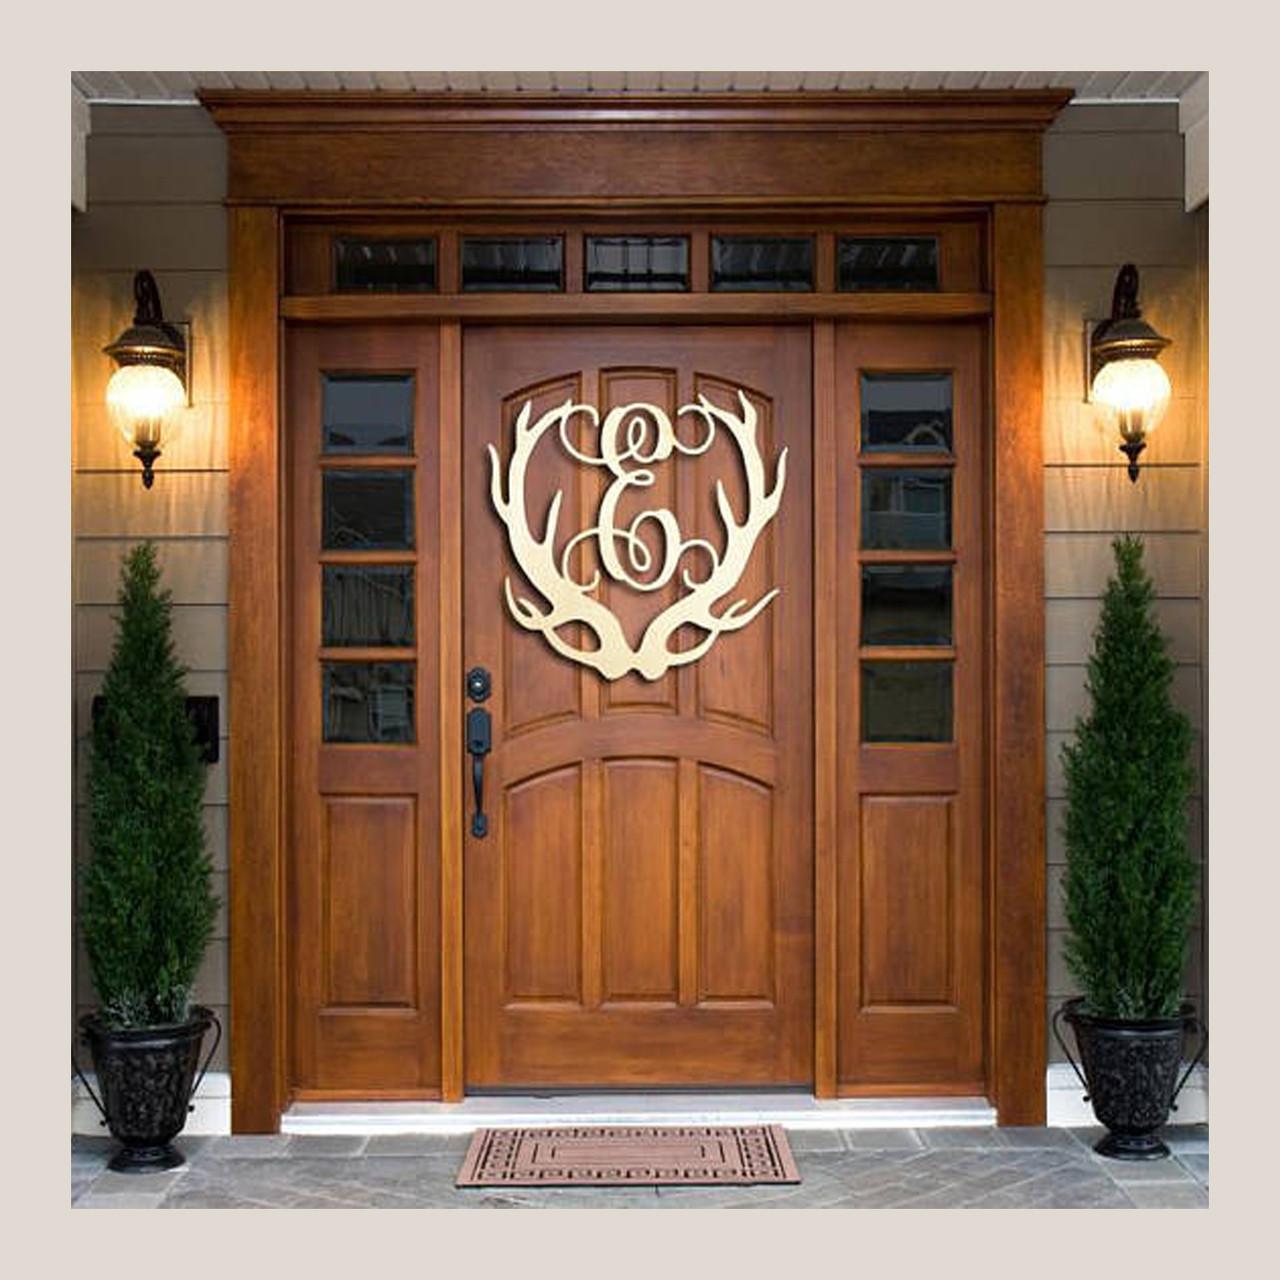 Wooden Antler Monogram Door Hanger & Christmas Antler Monogram Wreath  Holiday Decor Fast Shipping ...